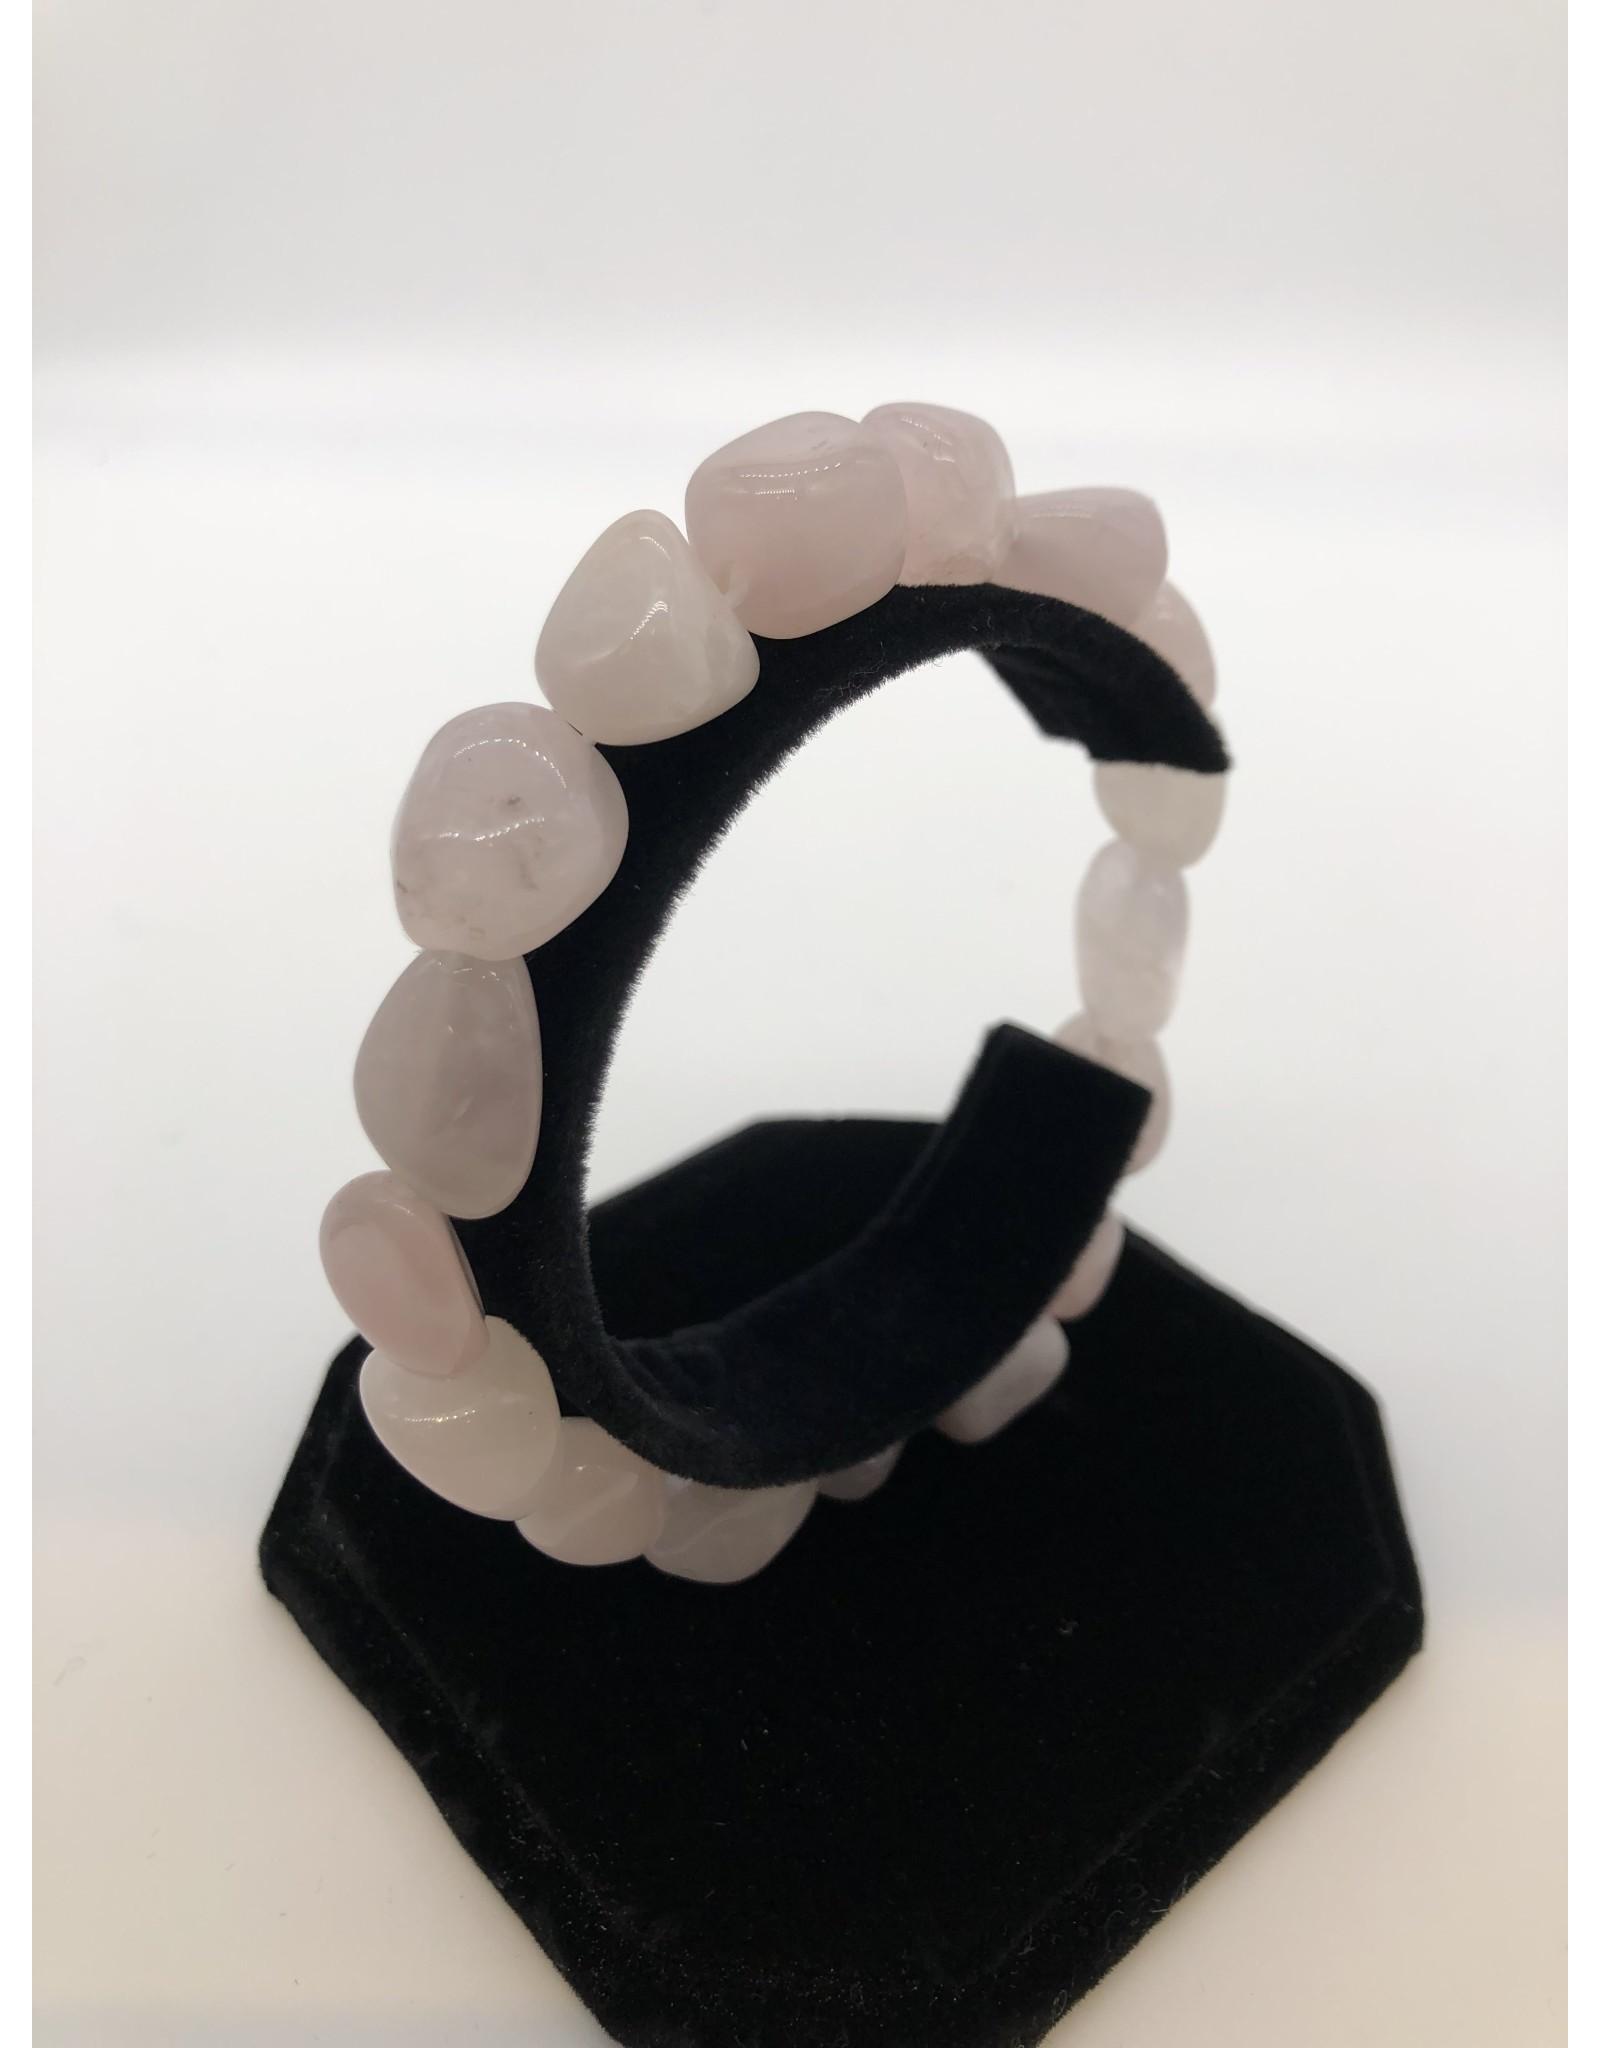 Rose Quartz Tumbled Gemstone Bracelet